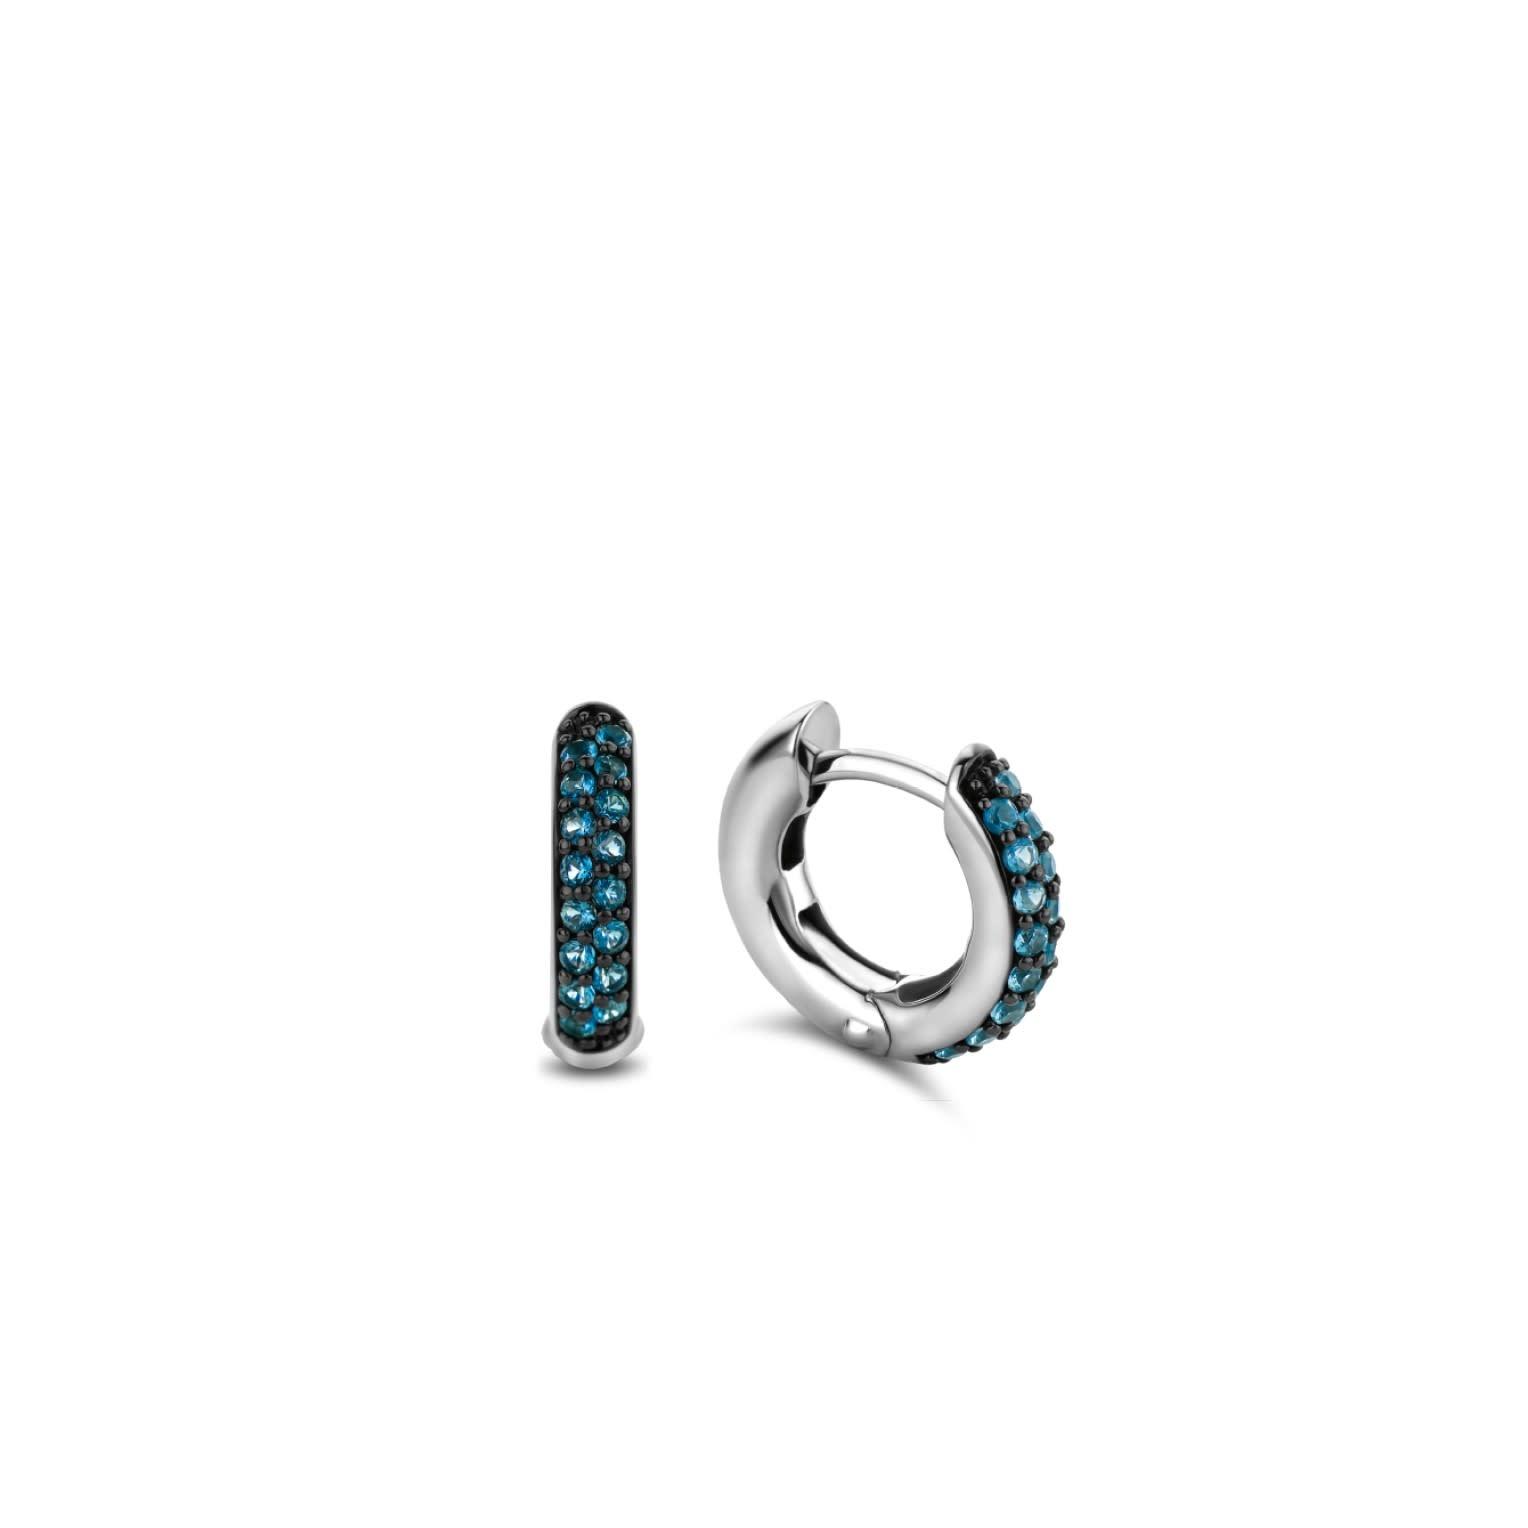 TI SENTO - Milano Earrings 7210DB-1